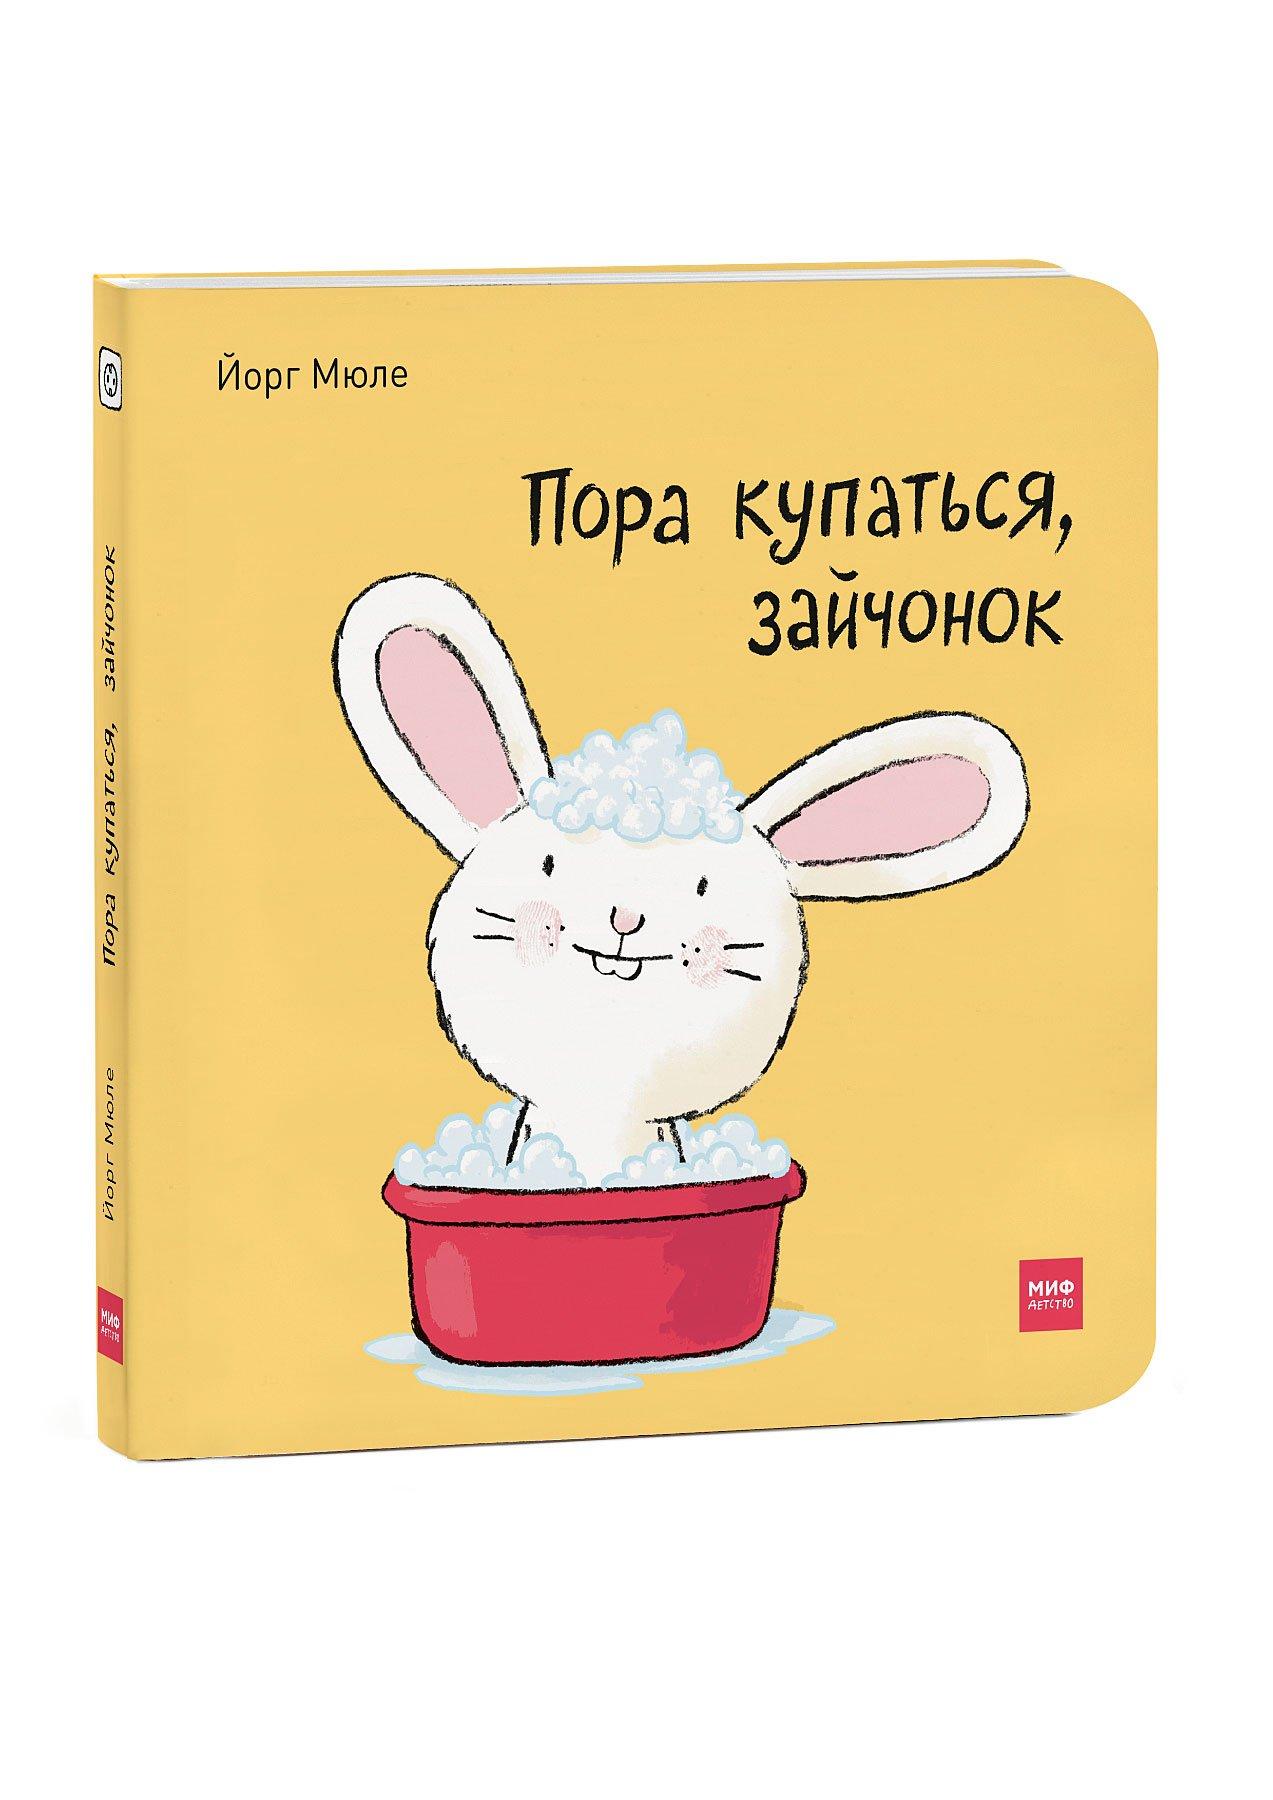 Йорг Мюле Пора купаться, зайчонок!